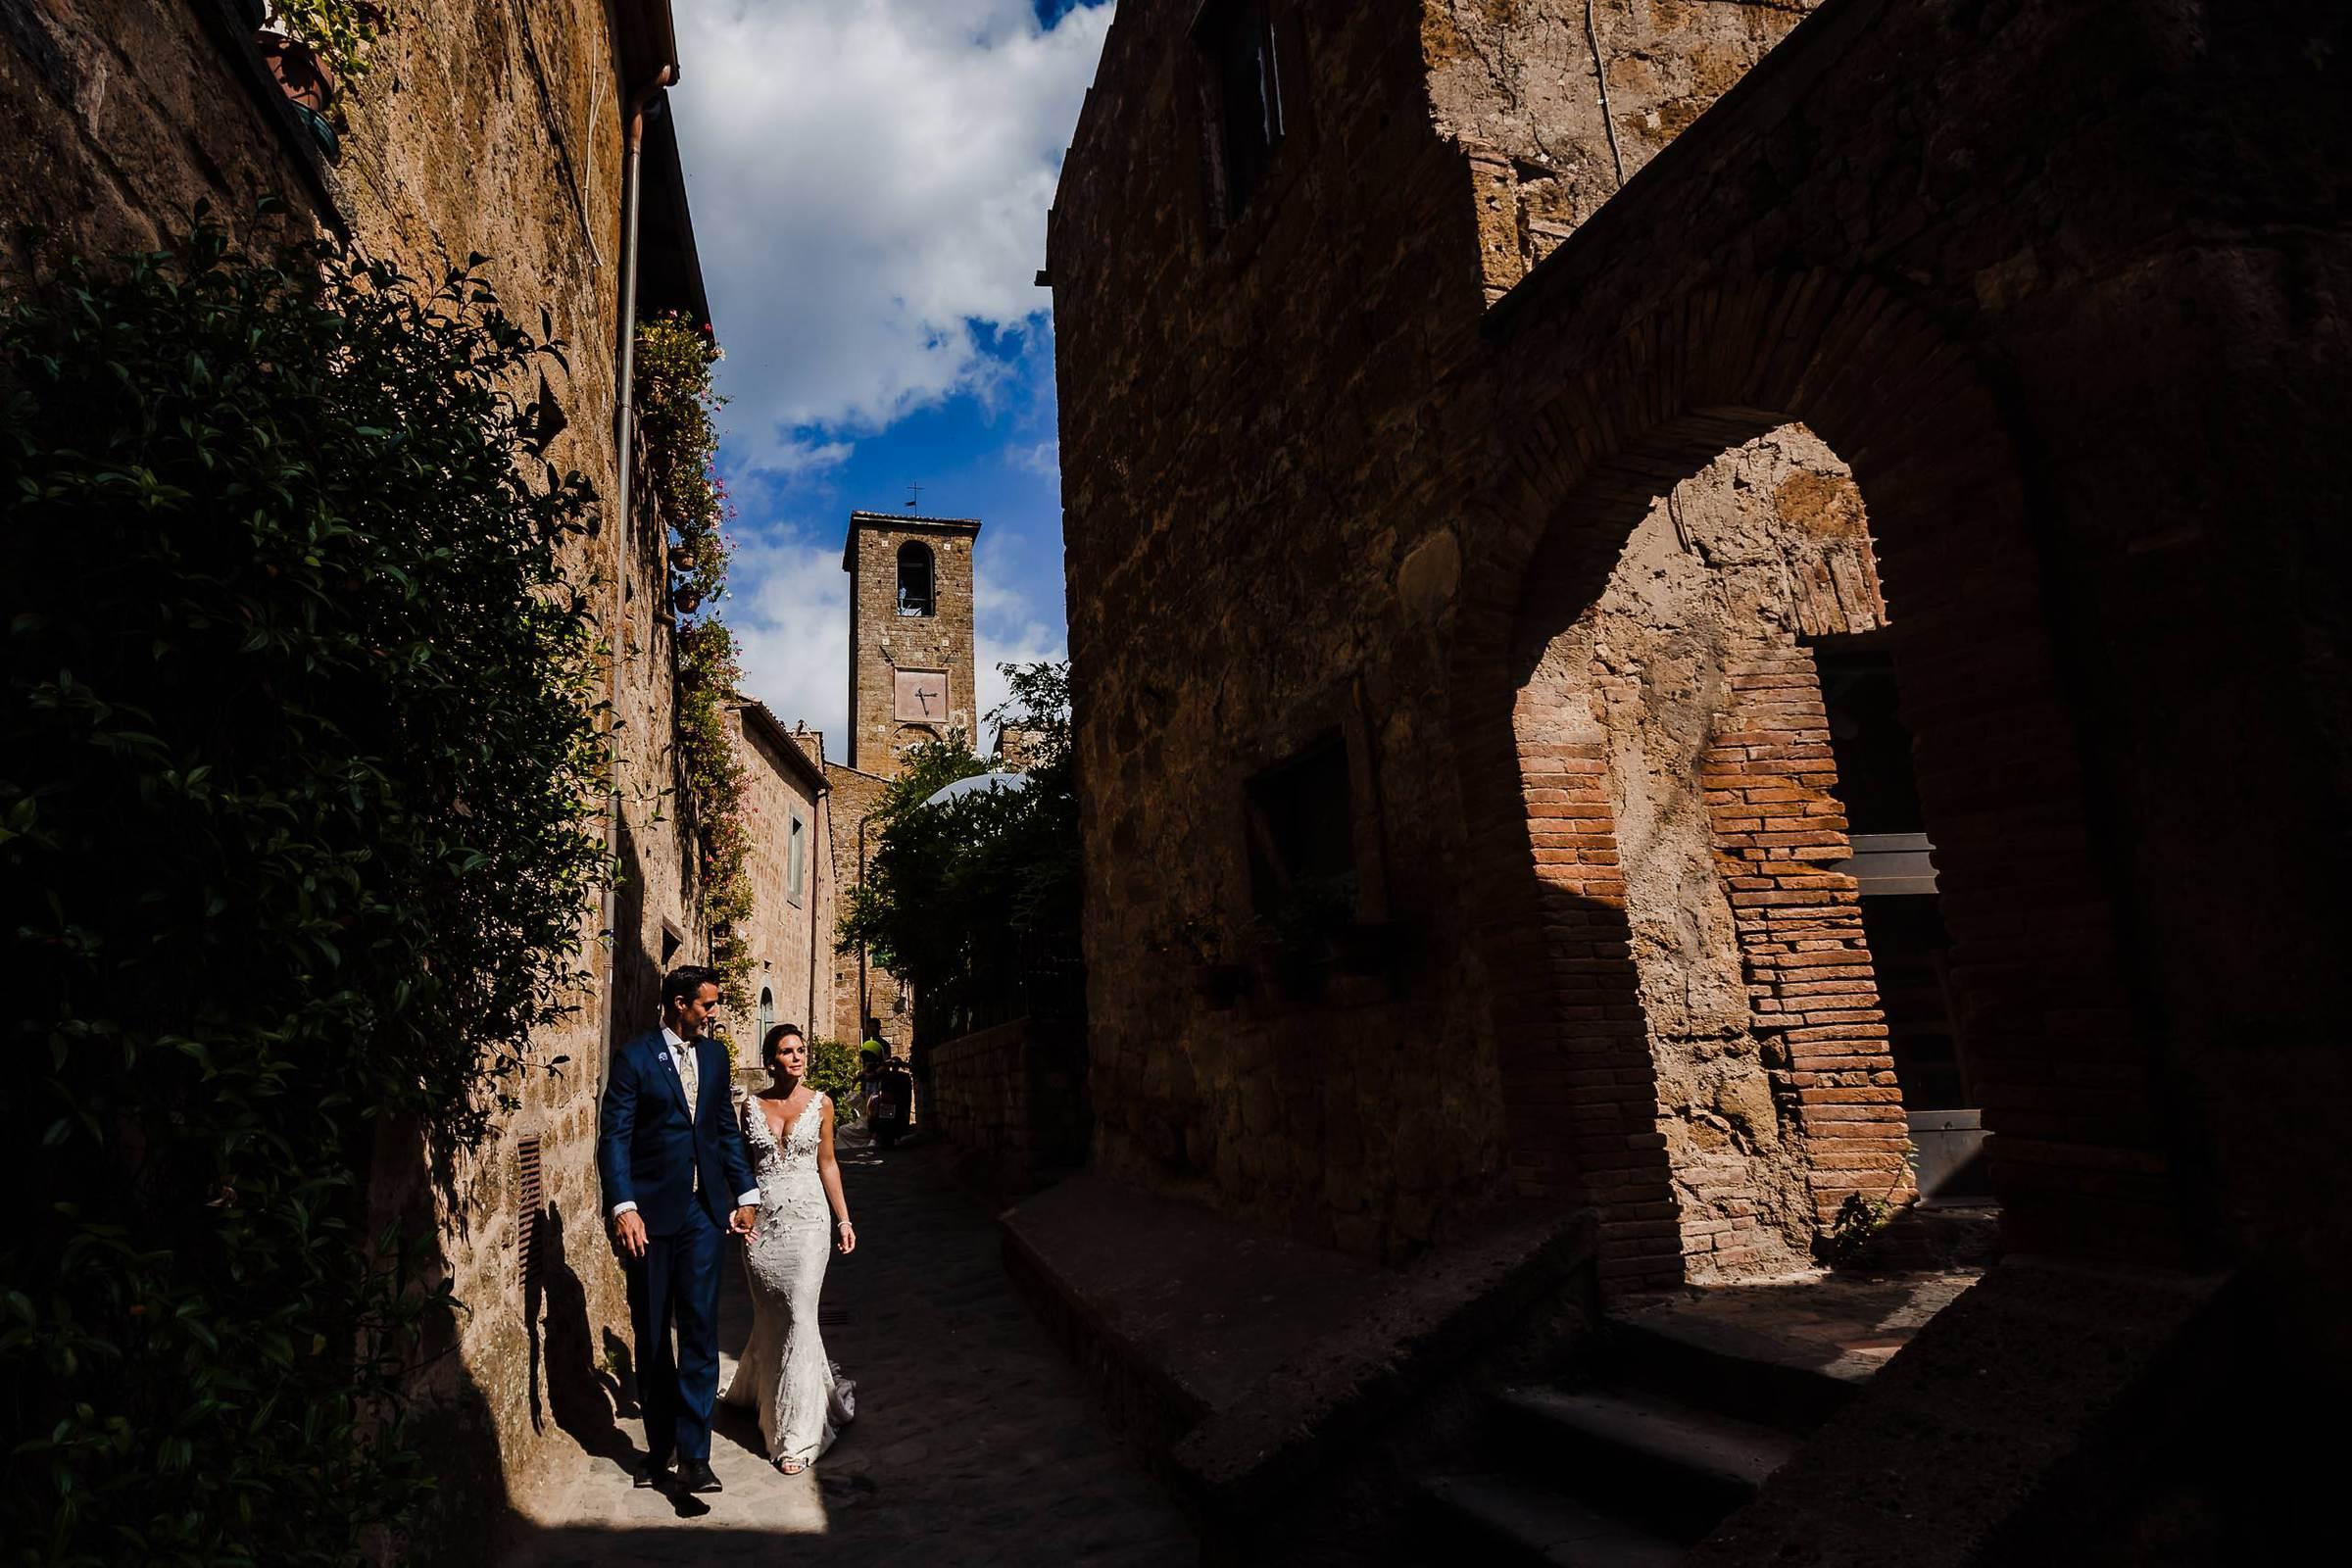 Bride and Groom walking through backstreets into civita di bagnoregio in Italy before their Villa Tre Grazie wedding celebration